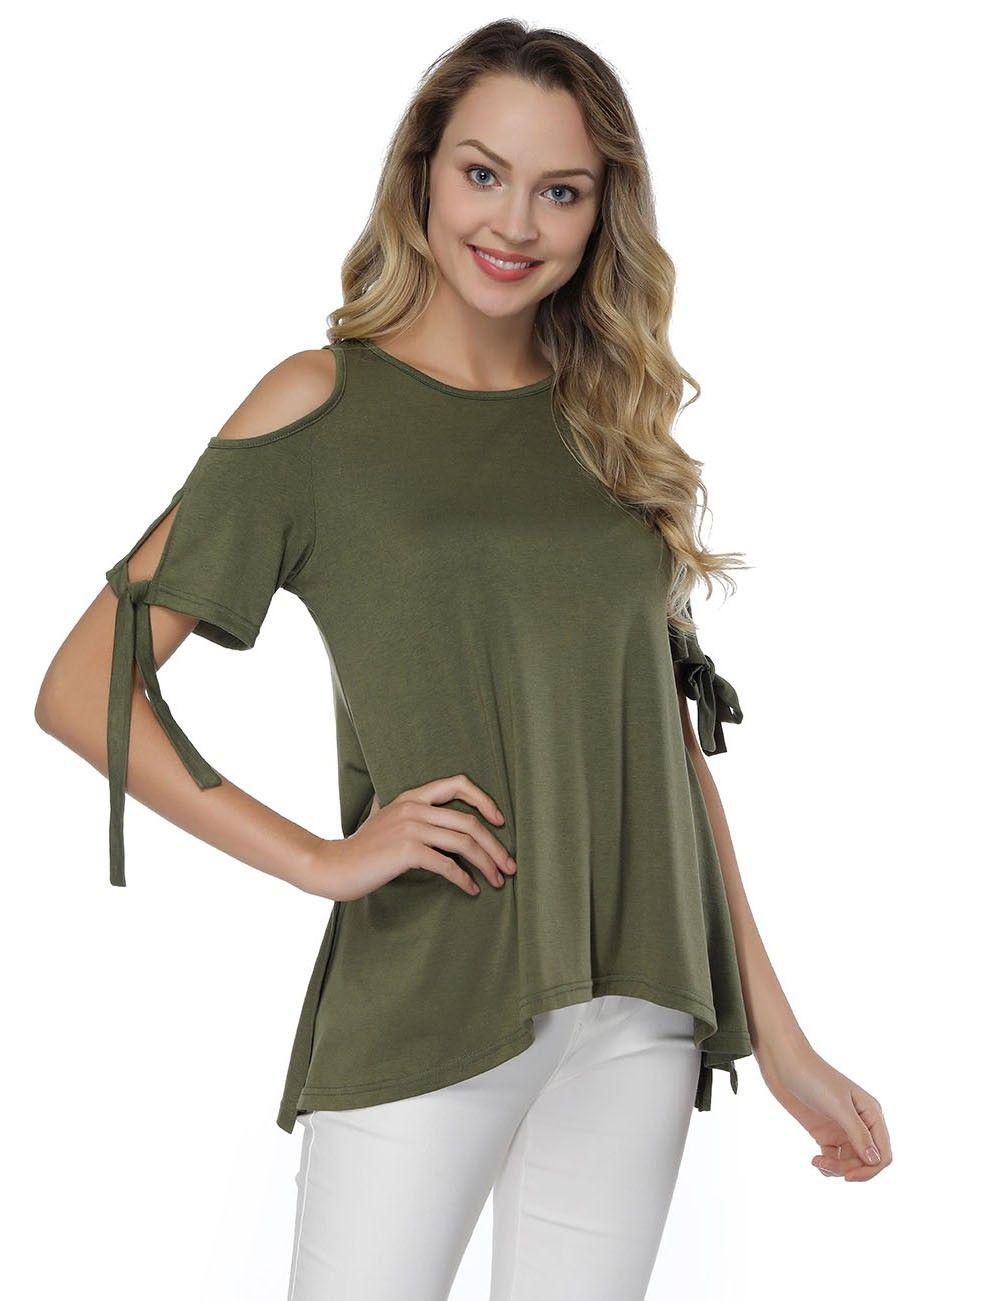 a1b26edbd7c574 Glossy Round Neck T-Shirt Green High-Low Hem Versatile Item